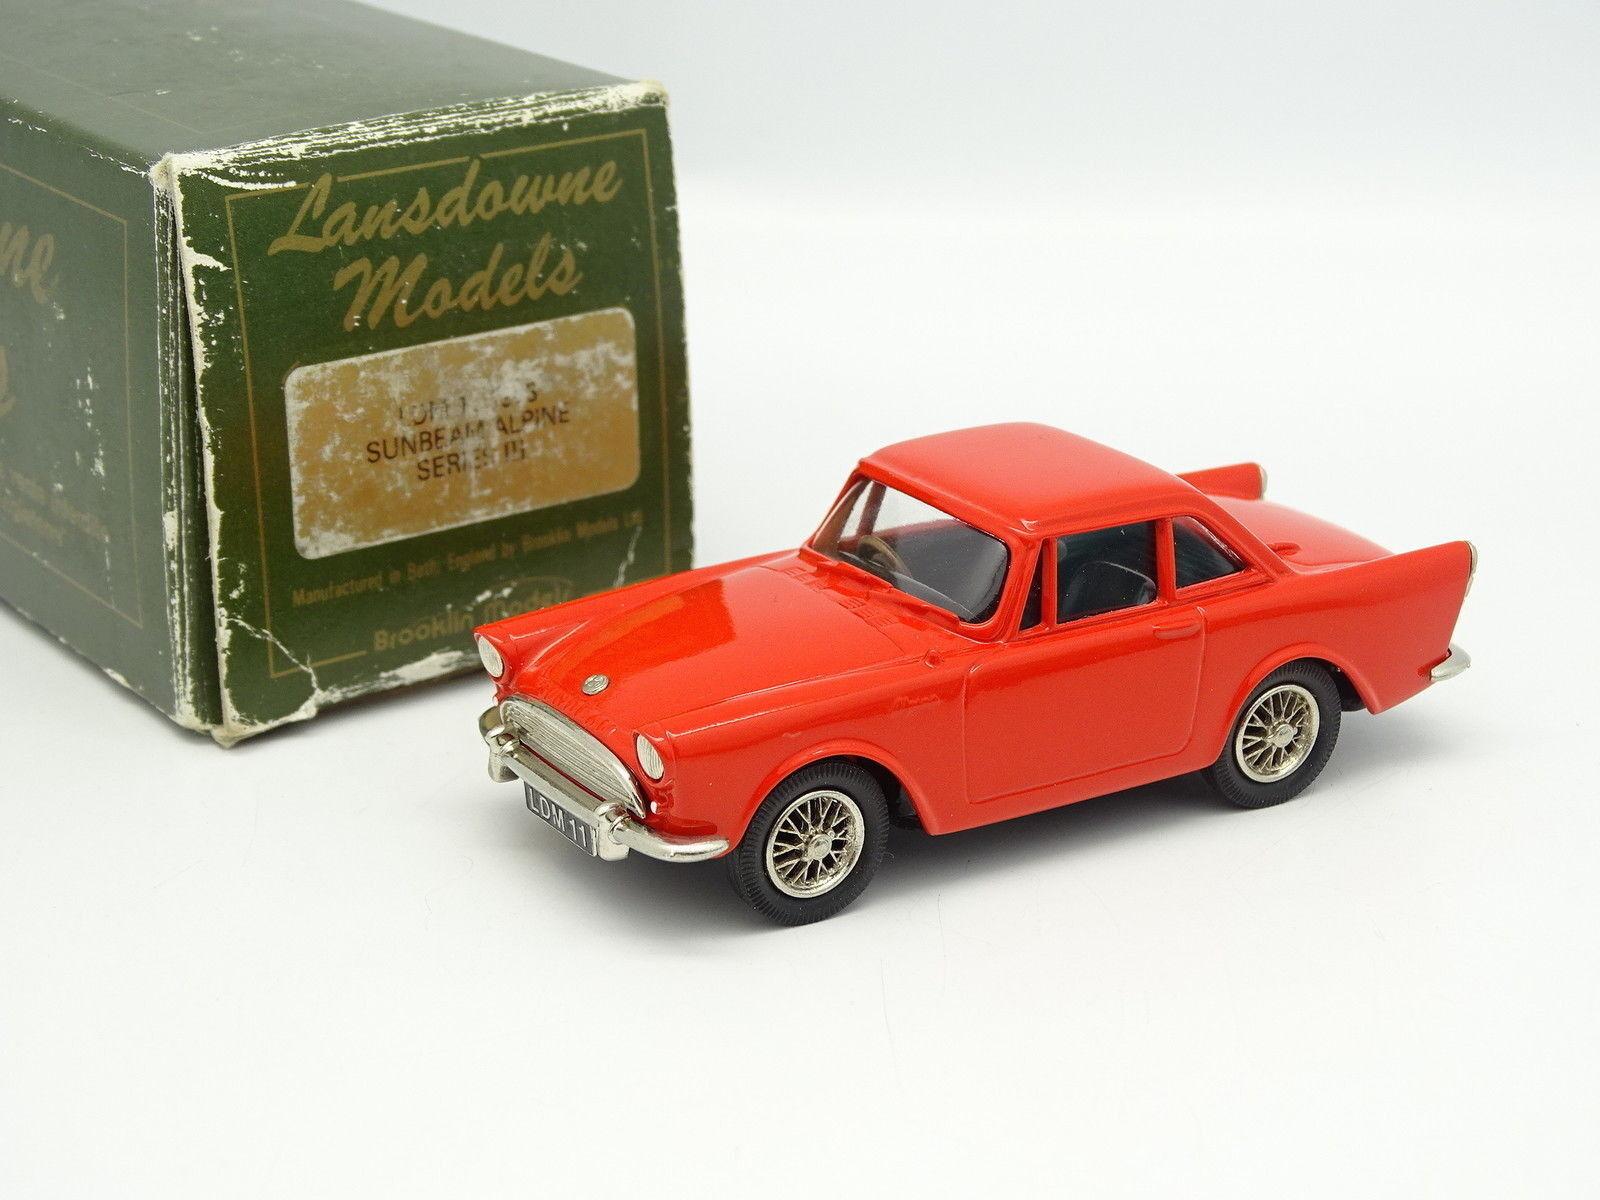 Lansdowne Modelle 1 43 - Sunbeam Alpine Serien III 1963